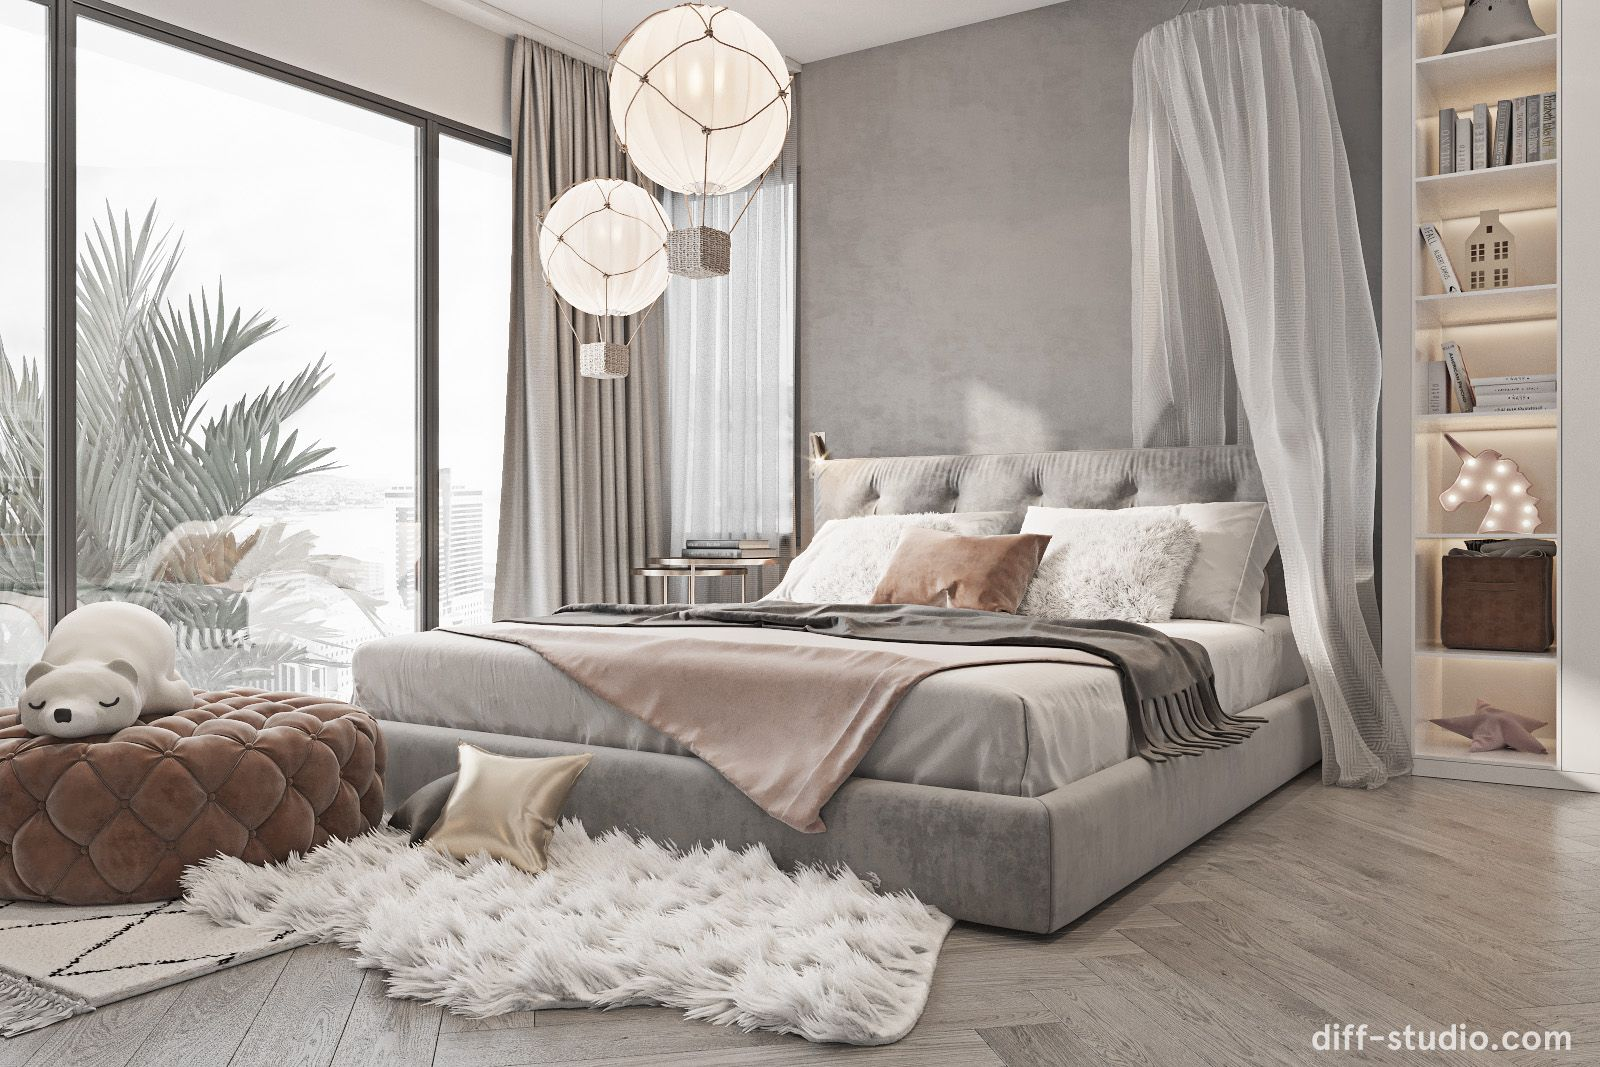 Top Project By Diff Studio Interior Design Inspiration Room Inspiration Bedroom Bedroom Interior Bedroom Decor Cozy